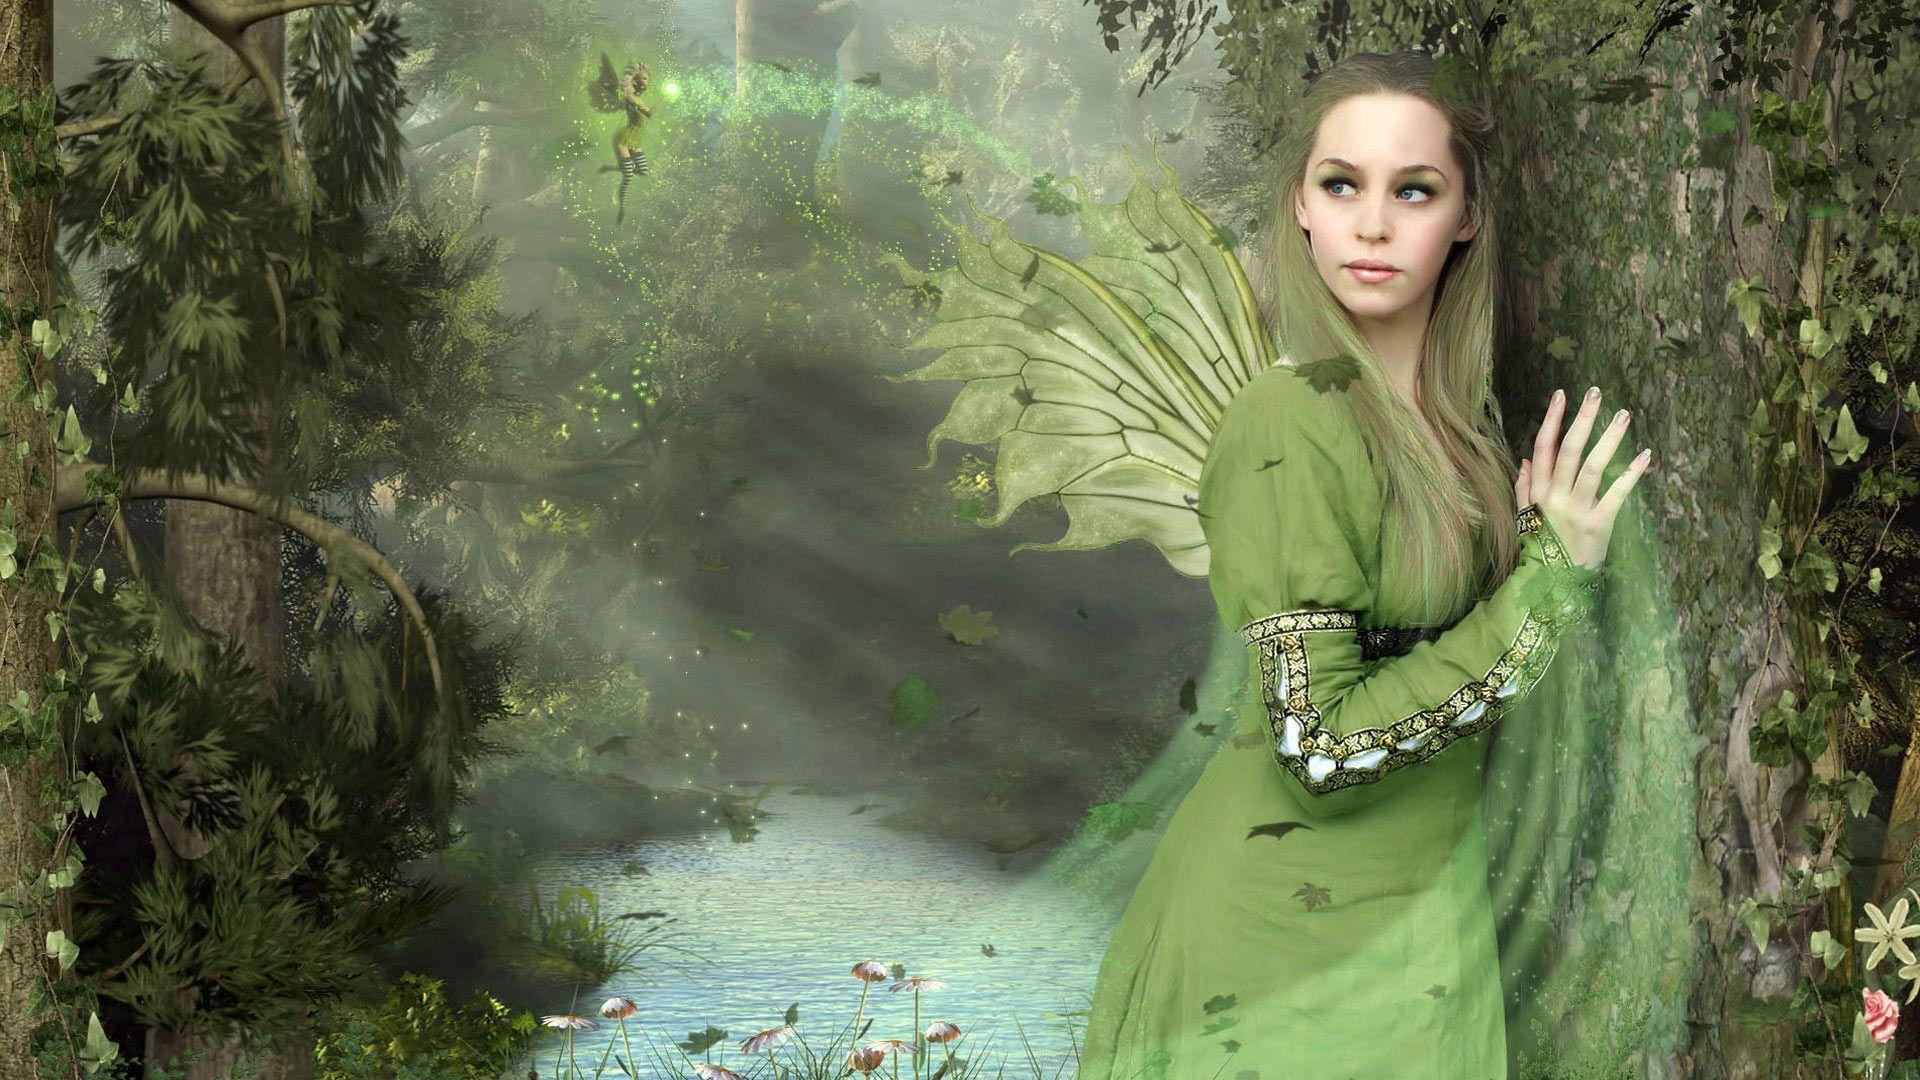 Fantasy Art Public Domain Fantasy Girls Wallpapers Pack